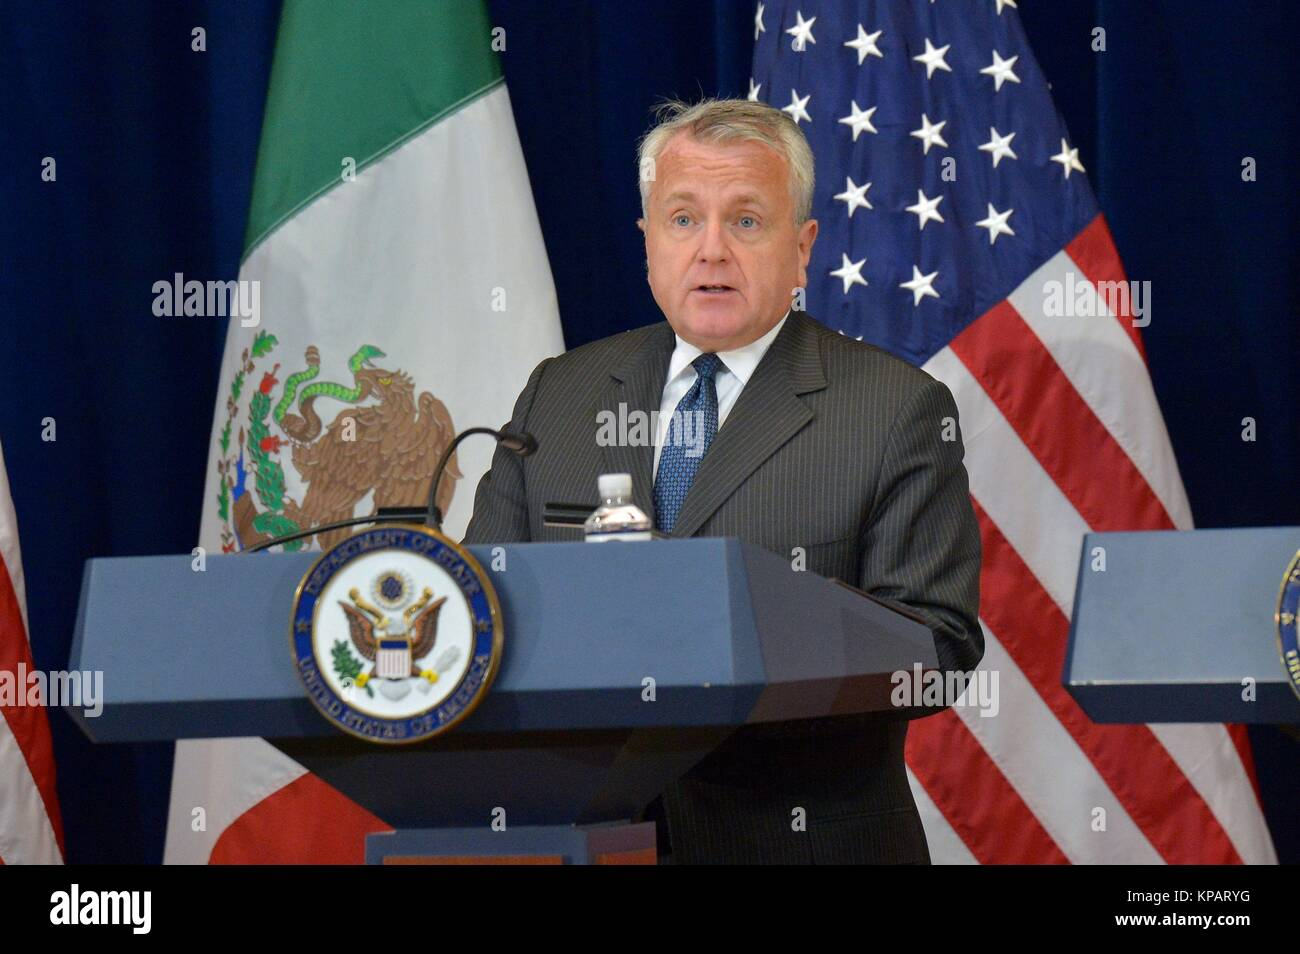 Washington DC, USA. 14th Dec, 2017. U.S. Deputy Secretary of State John Sullivan delivers remarks at the Second - Stock Image